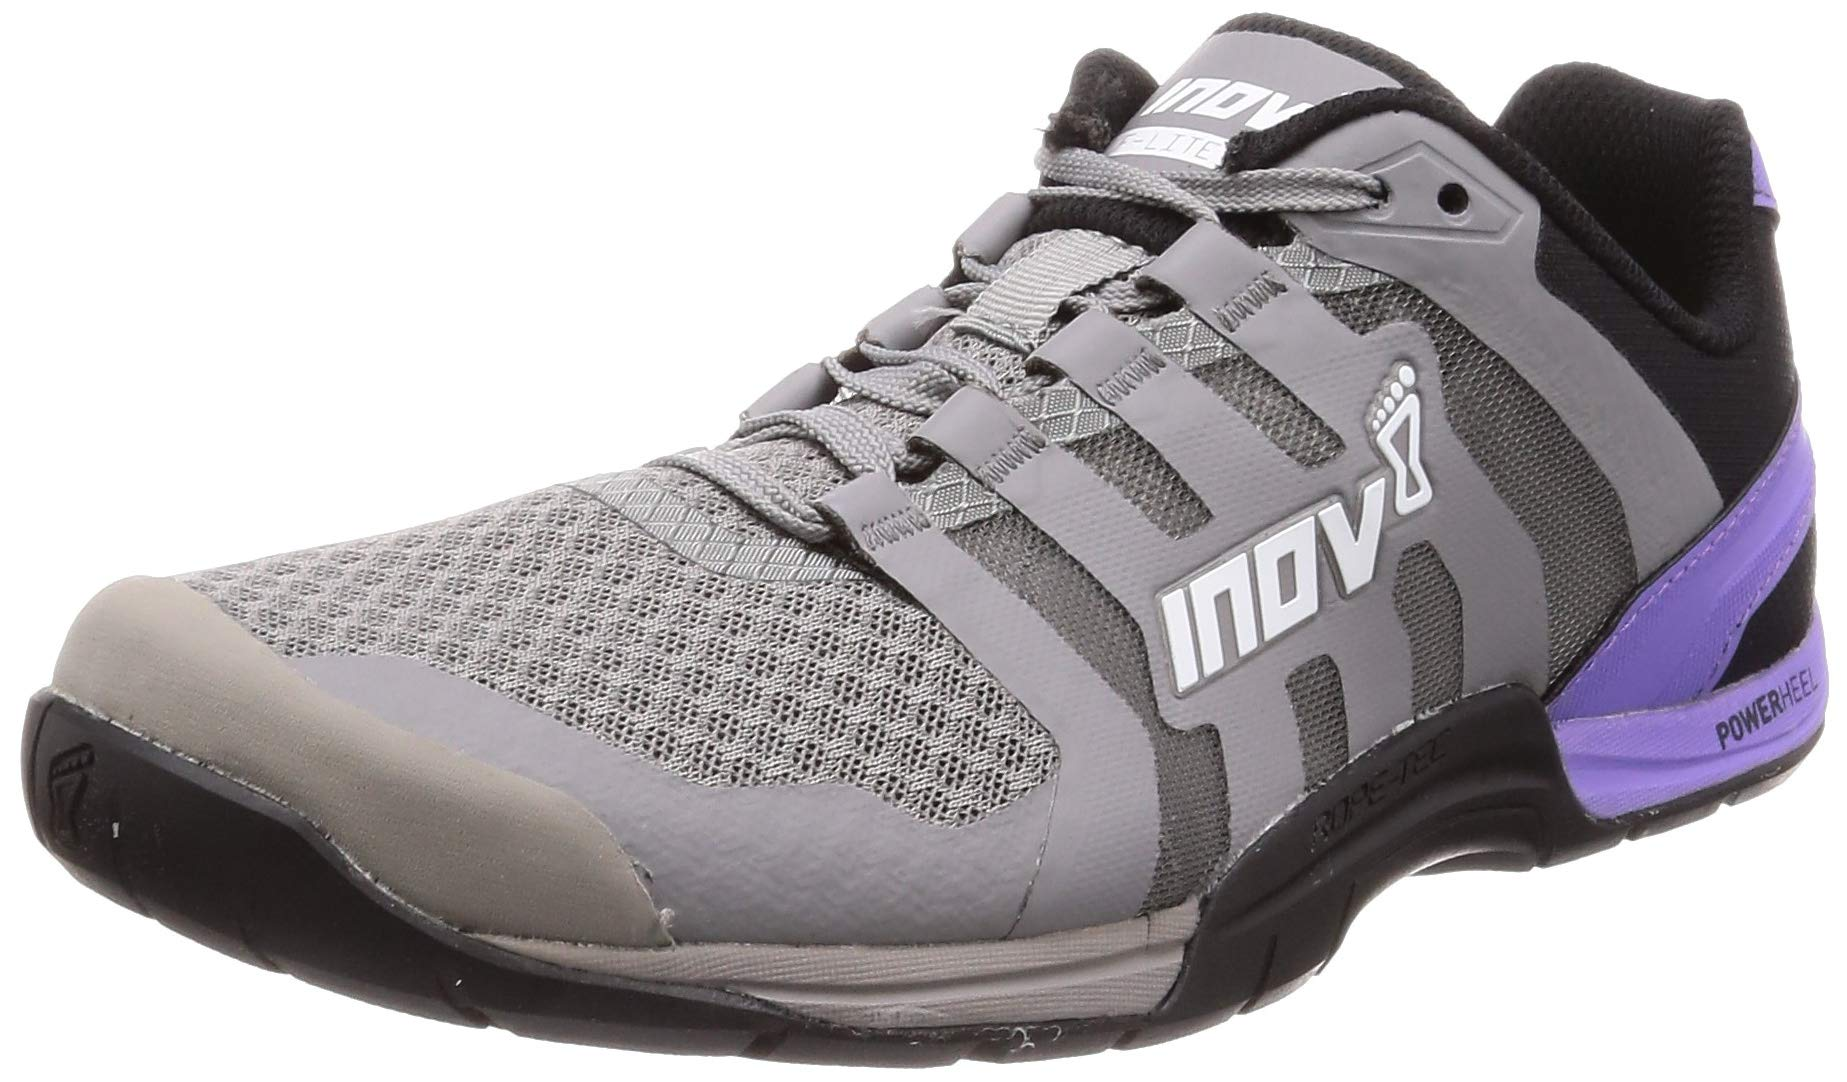 Inov-8 Womens F-Lite 235 V2 - Lightweight Minimalist Cross Training Shoes - Zero Drop - Athletic Shoe for Gym, Training and Weight Lifting - Wide Toe Box - Grey/Purple M6.5/ W8 by Inov-8